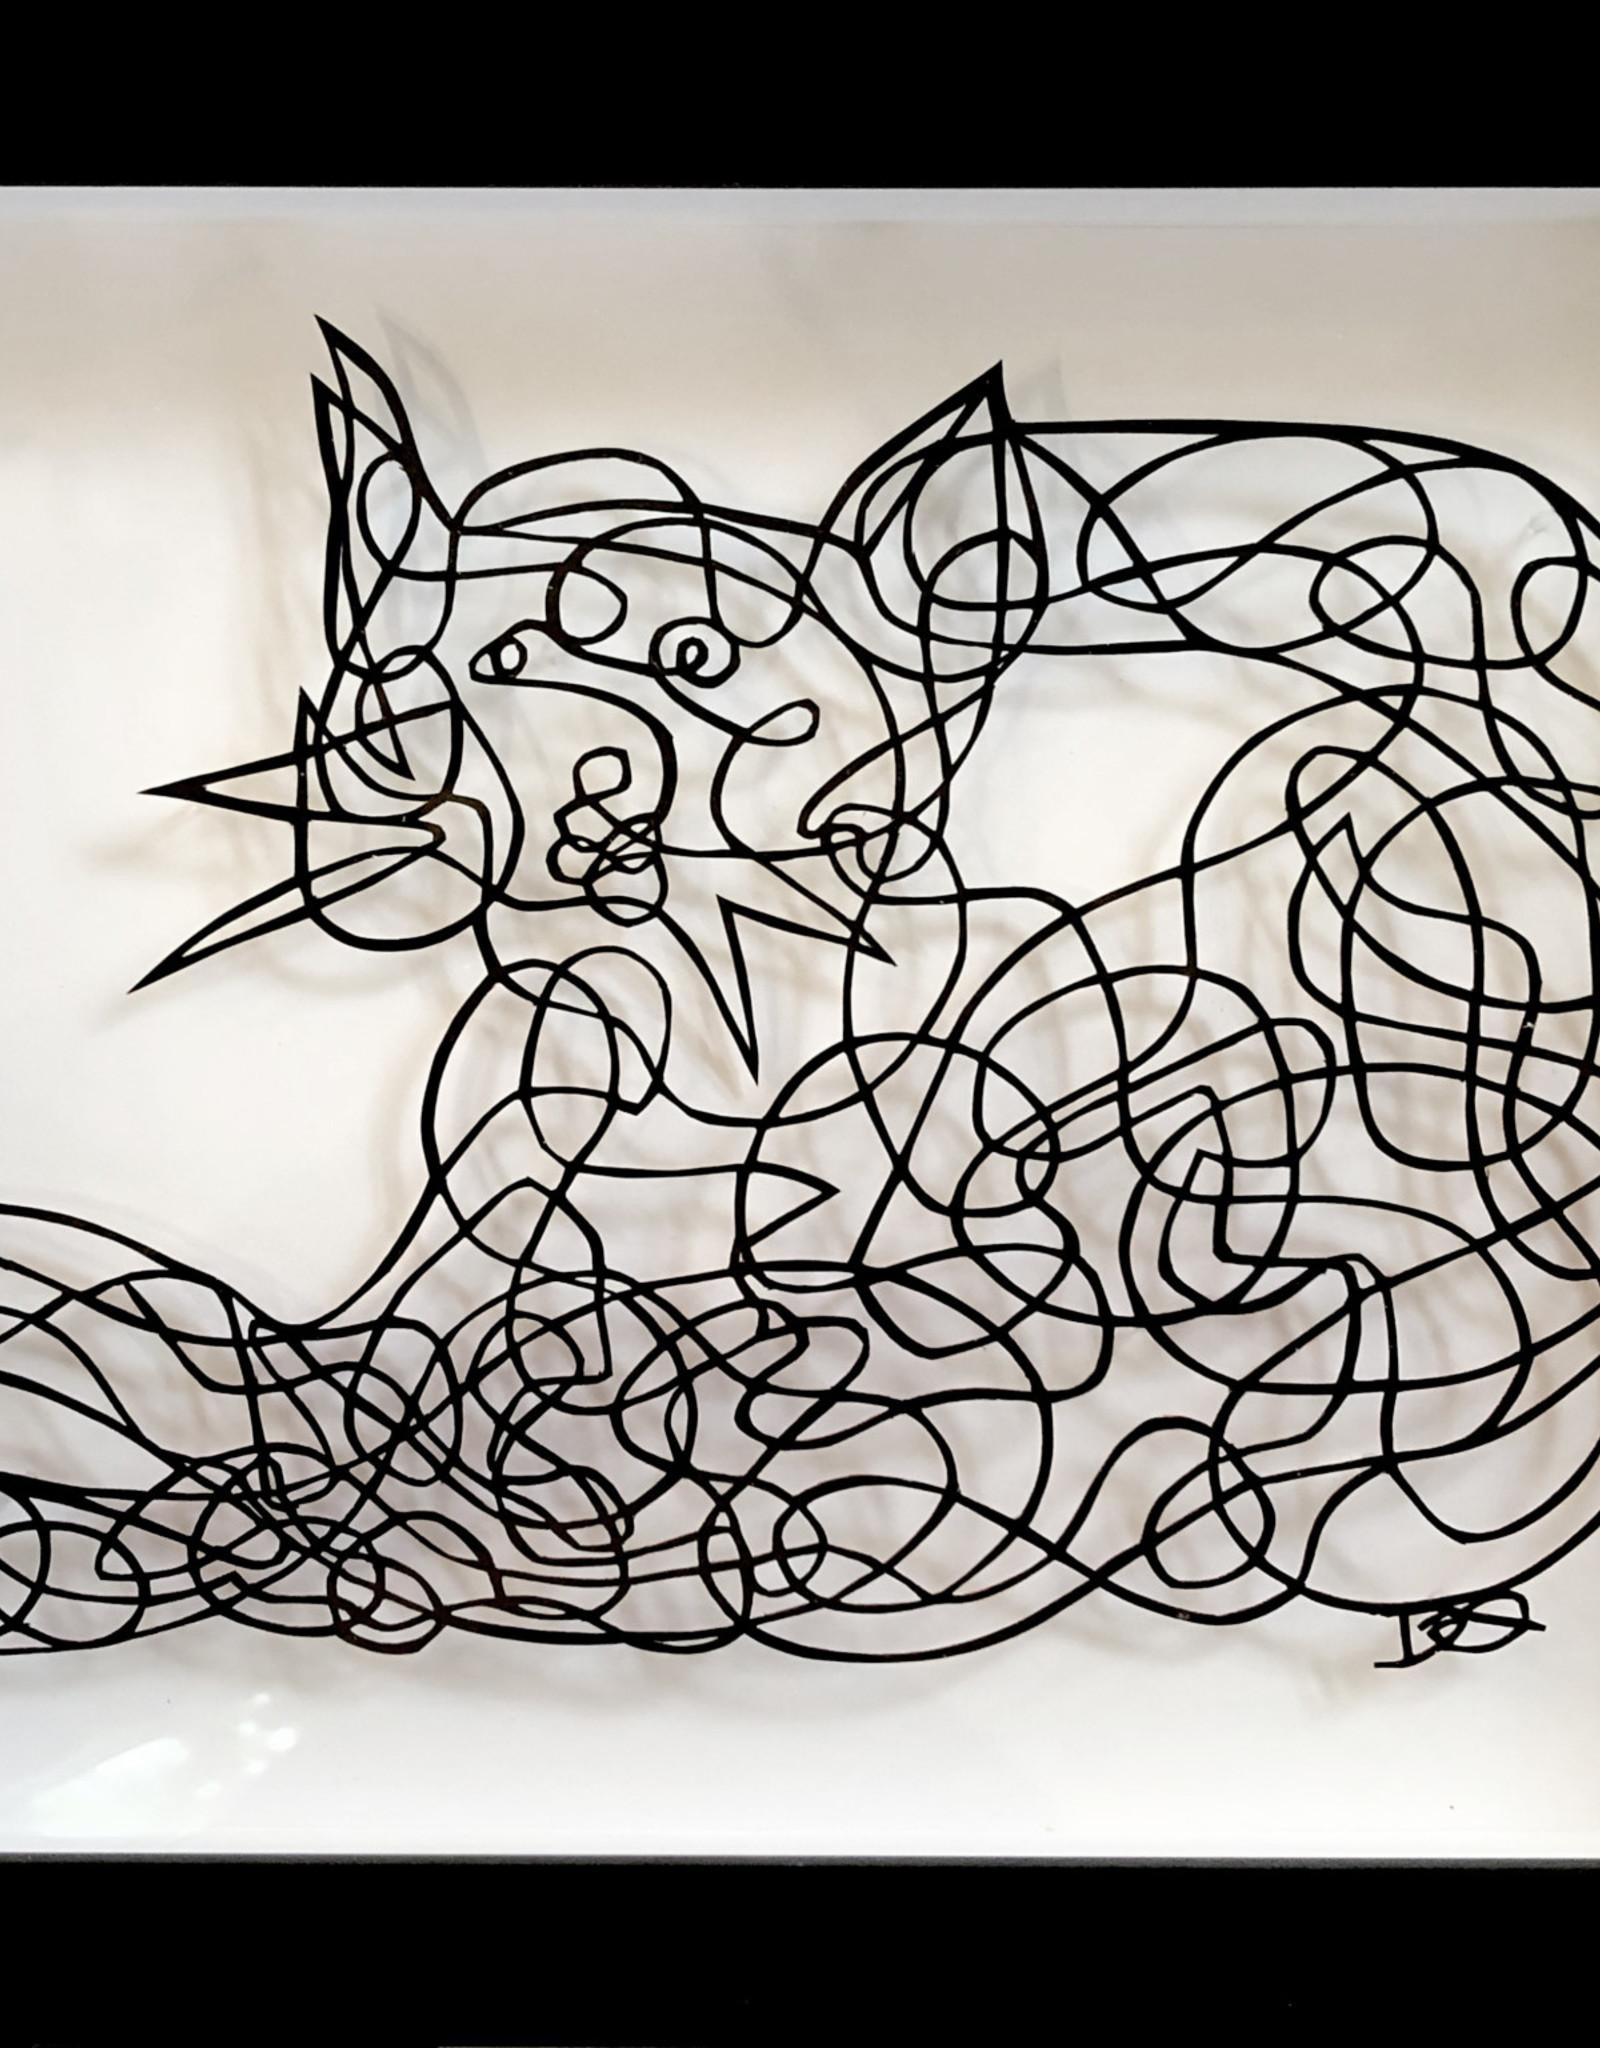 David Friedman Cat One Liner - Papercut